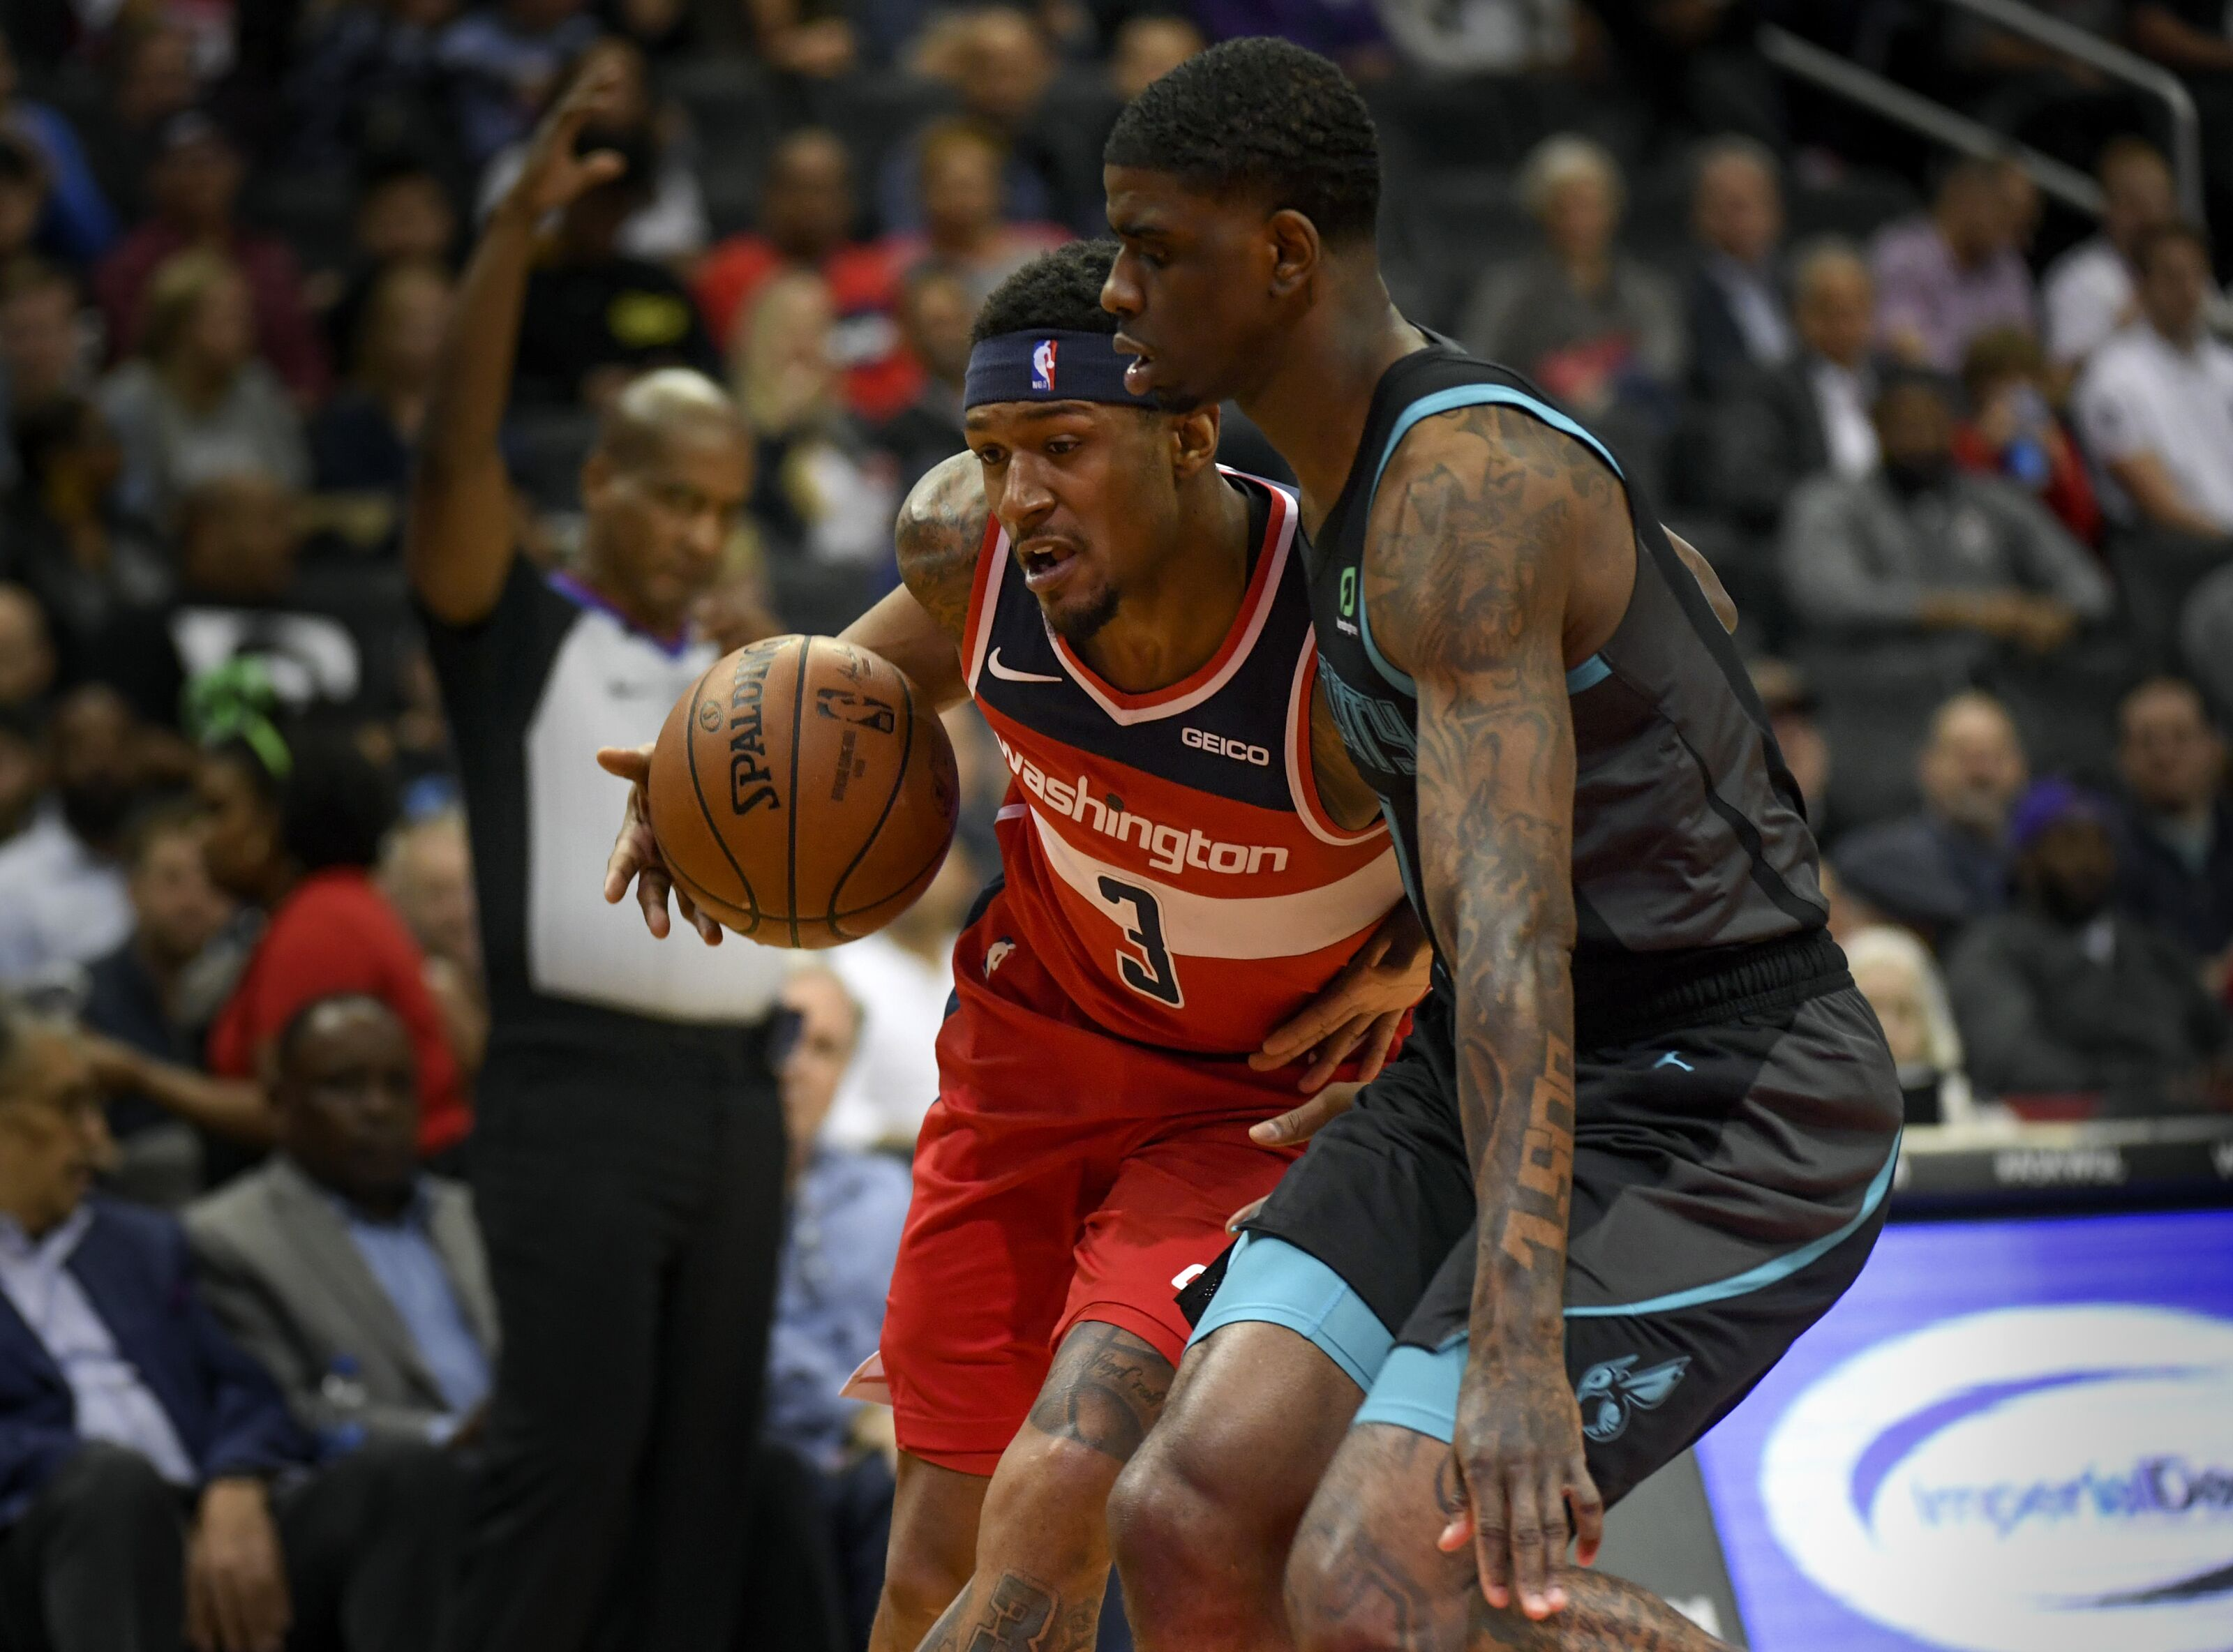 Charlotte Hornets: The Defense Has Been Horrible, But It's Not Hopeless